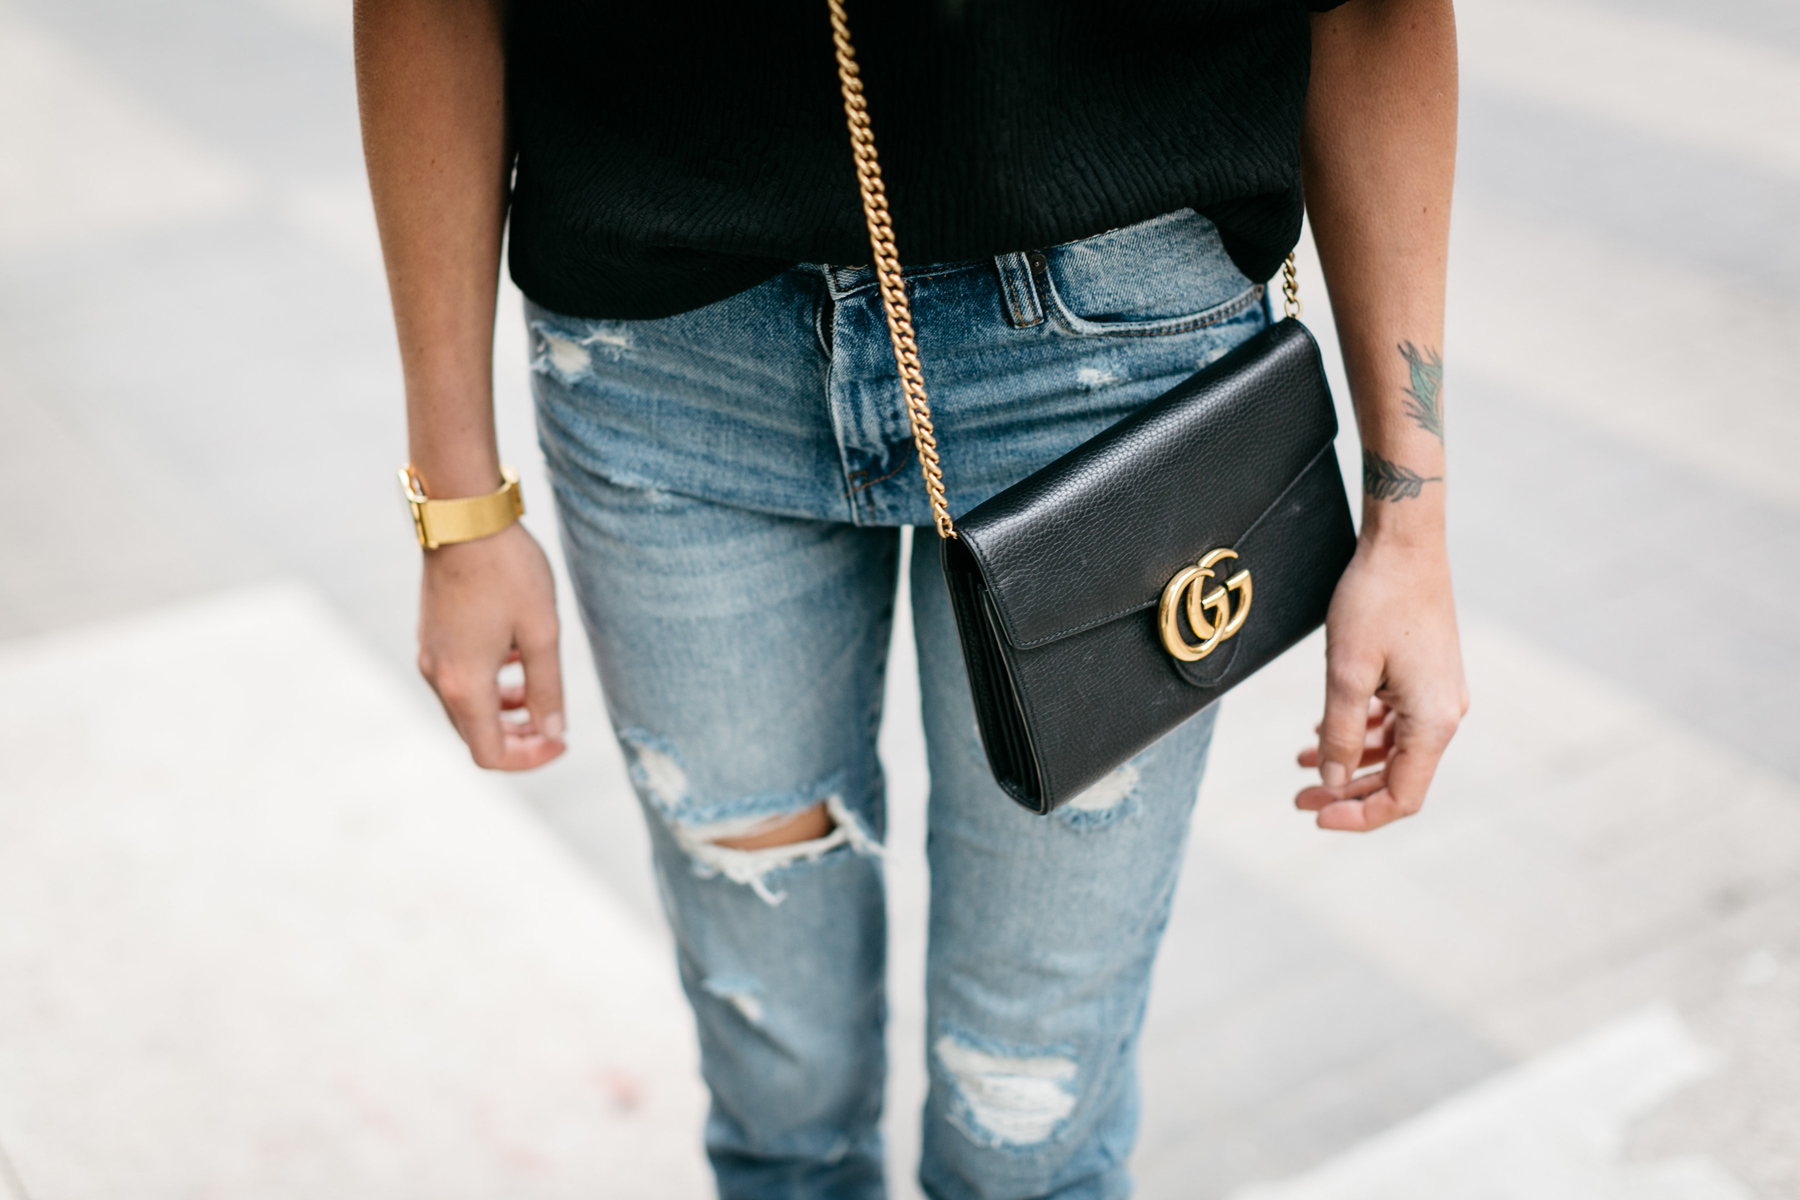 Gucci Marmont Handbag, Mom Jeans